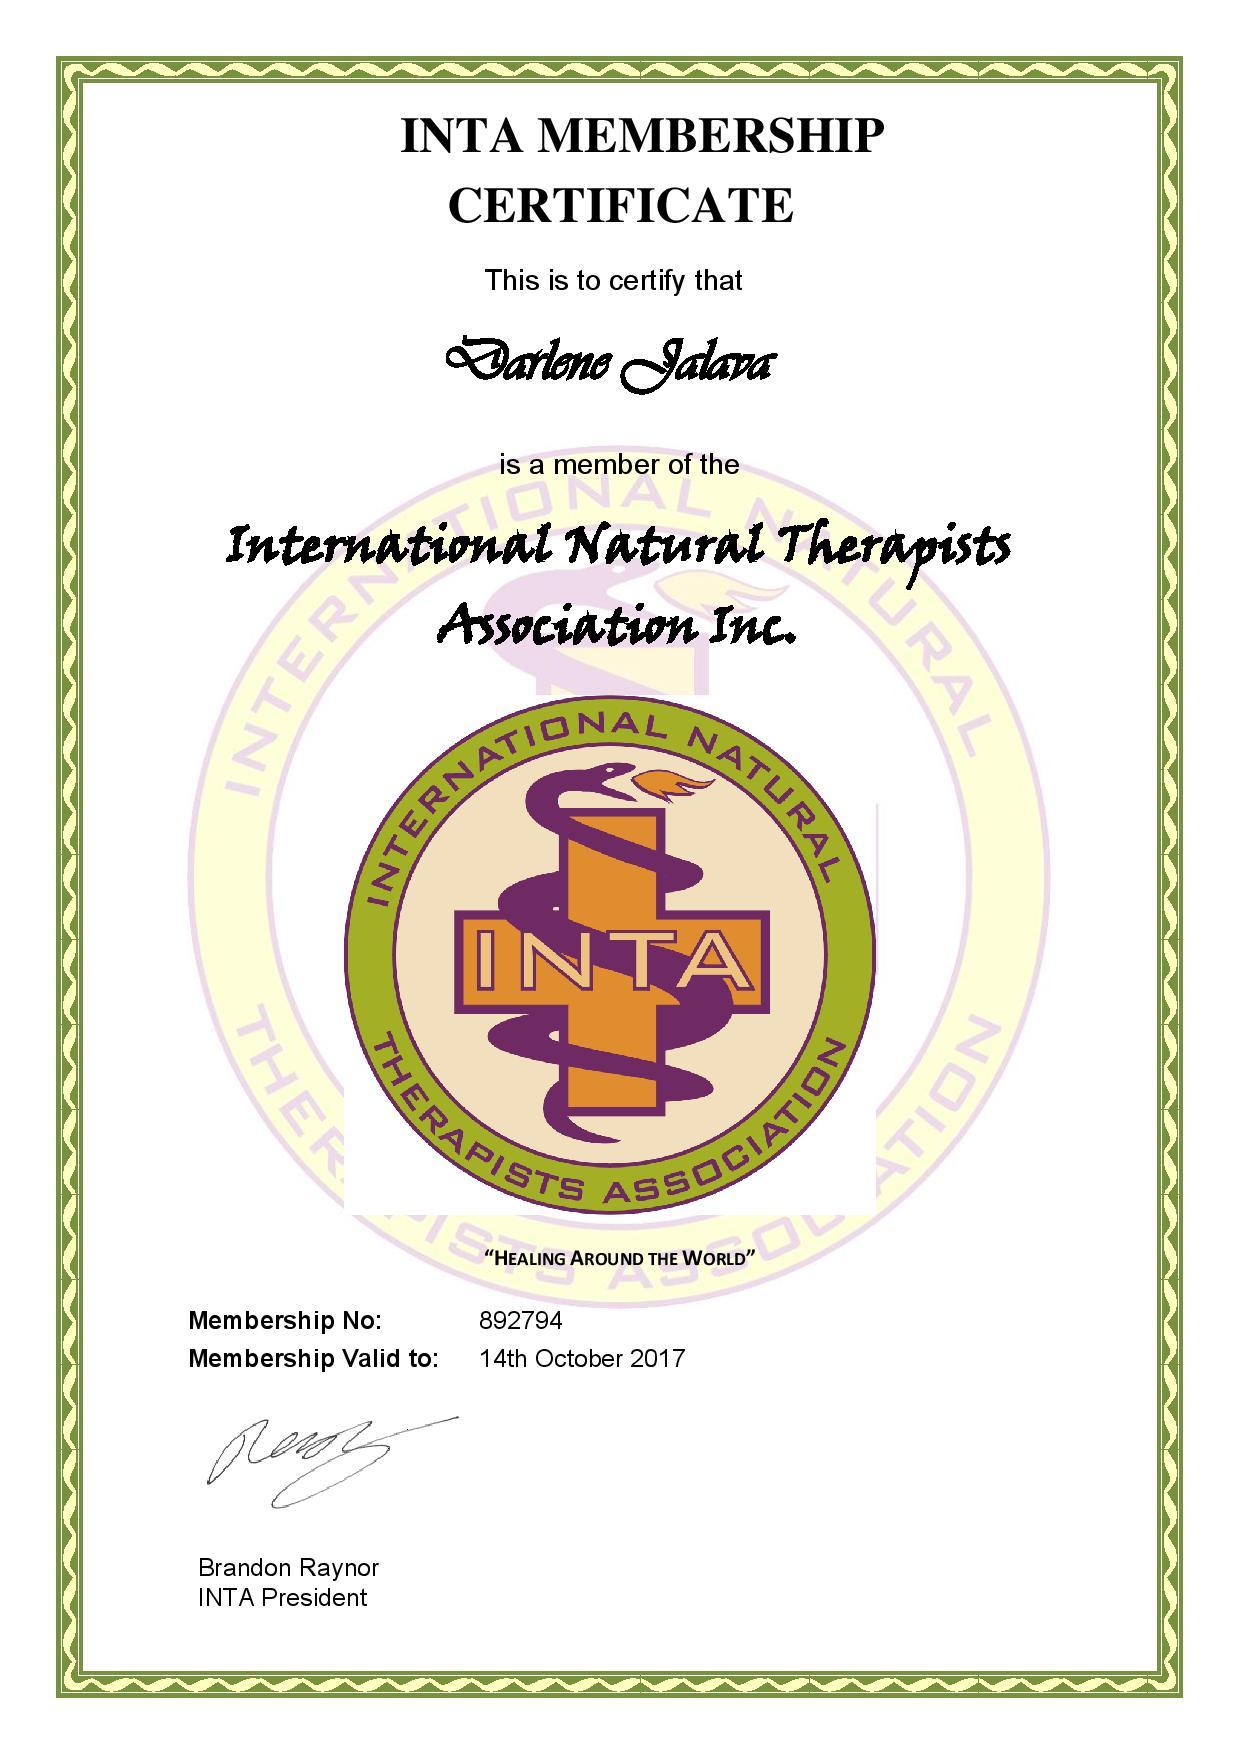 inta-certificate-for-darlene-jalava-page-001